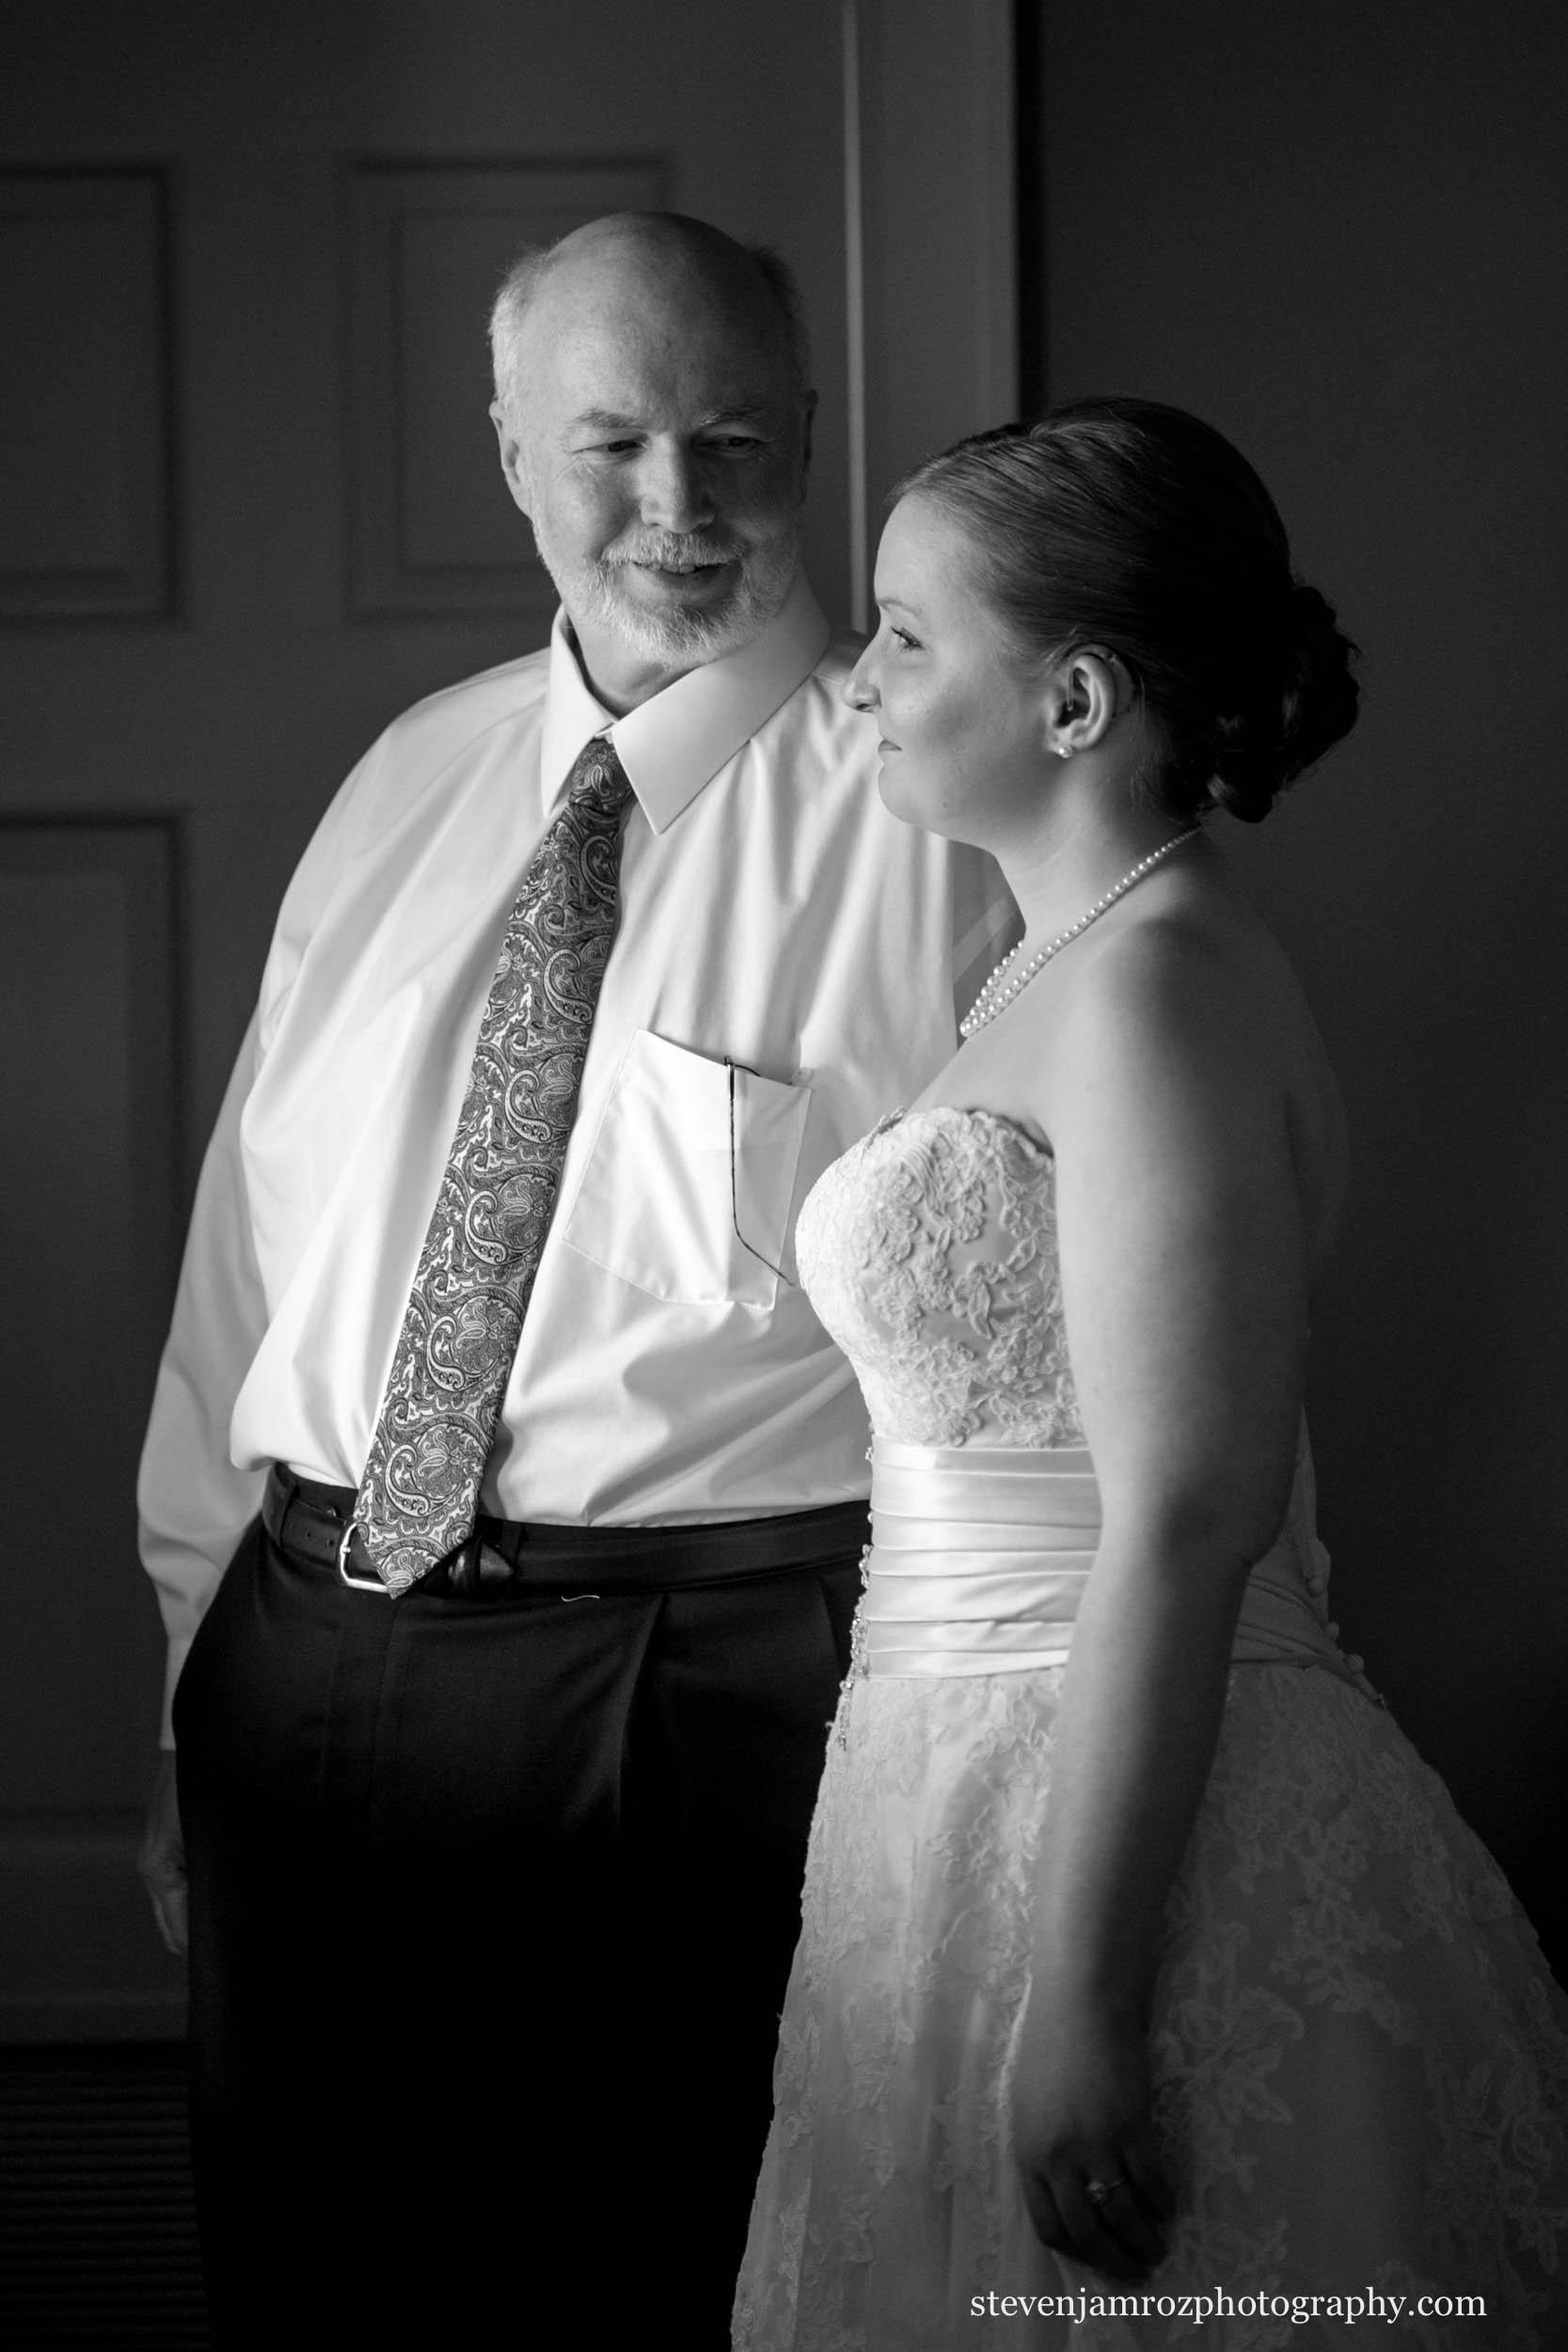 dad-bride-reflect-before-ceremony-wedding-charlotte-nc-steven-jamroz-0733.jpg